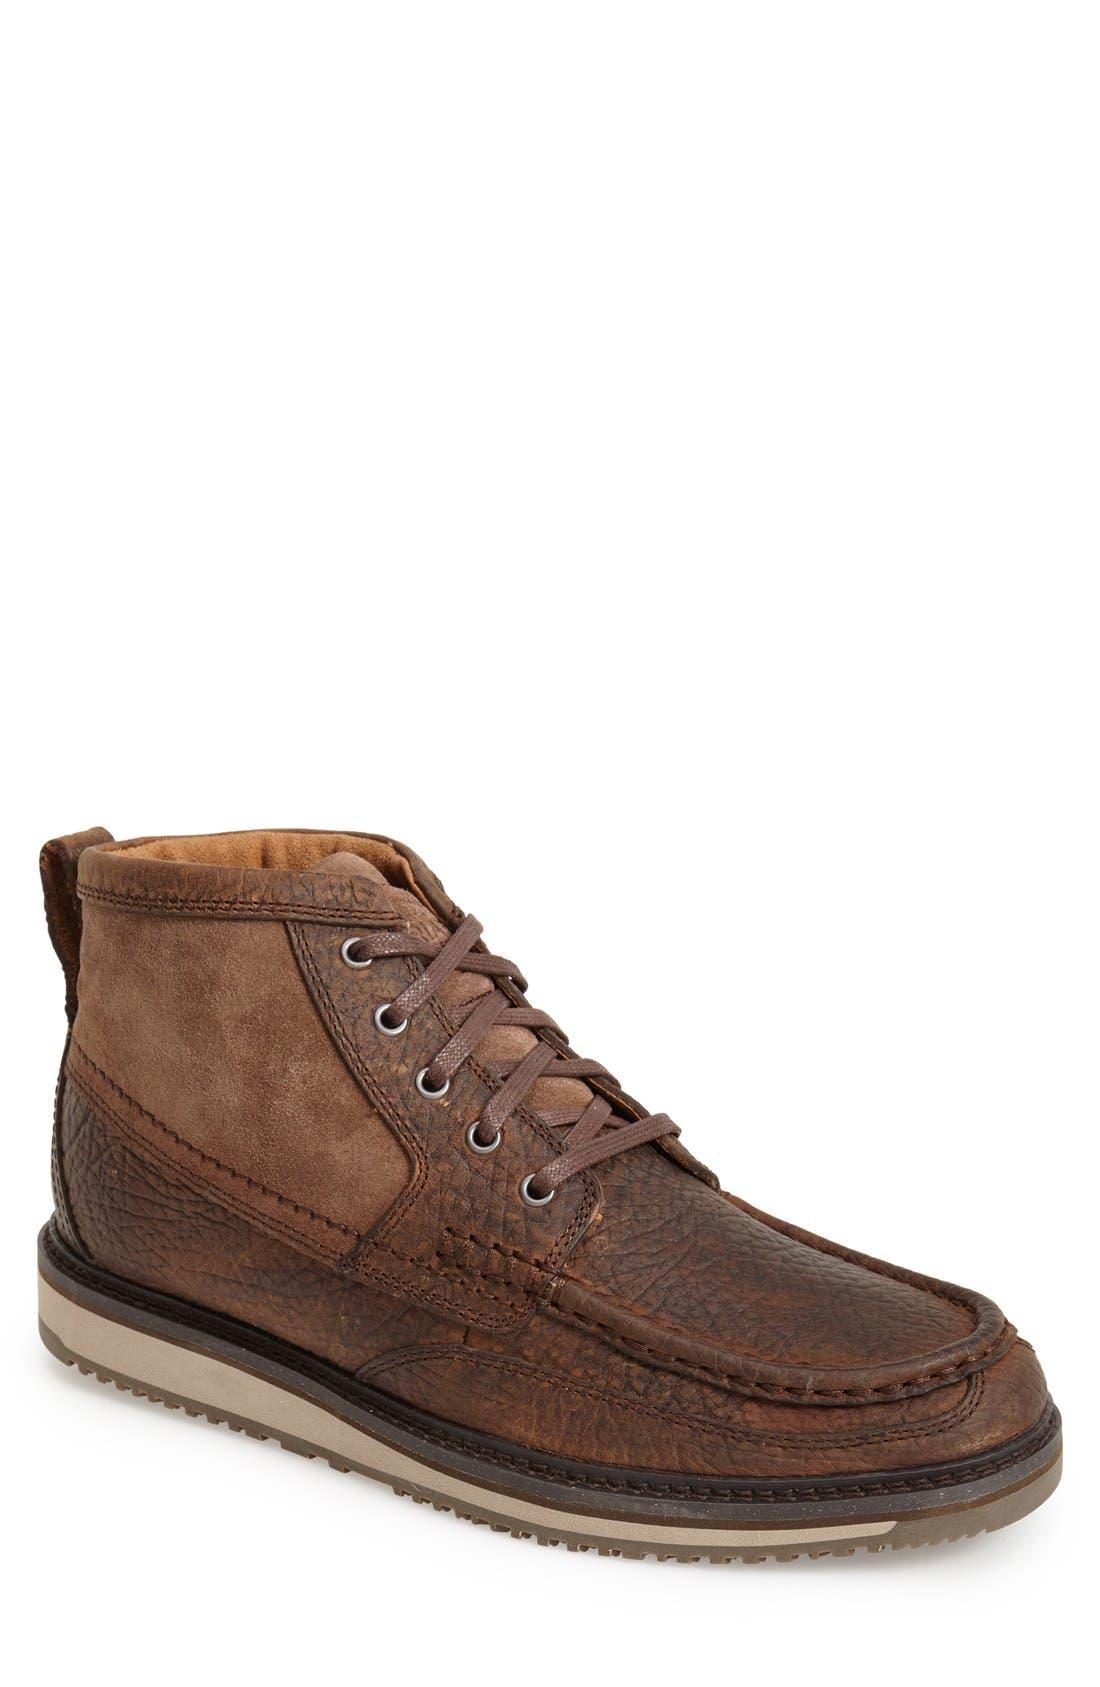 'Lookout' Moc Toe Boot,                             Main thumbnail 1, color,                             Brown